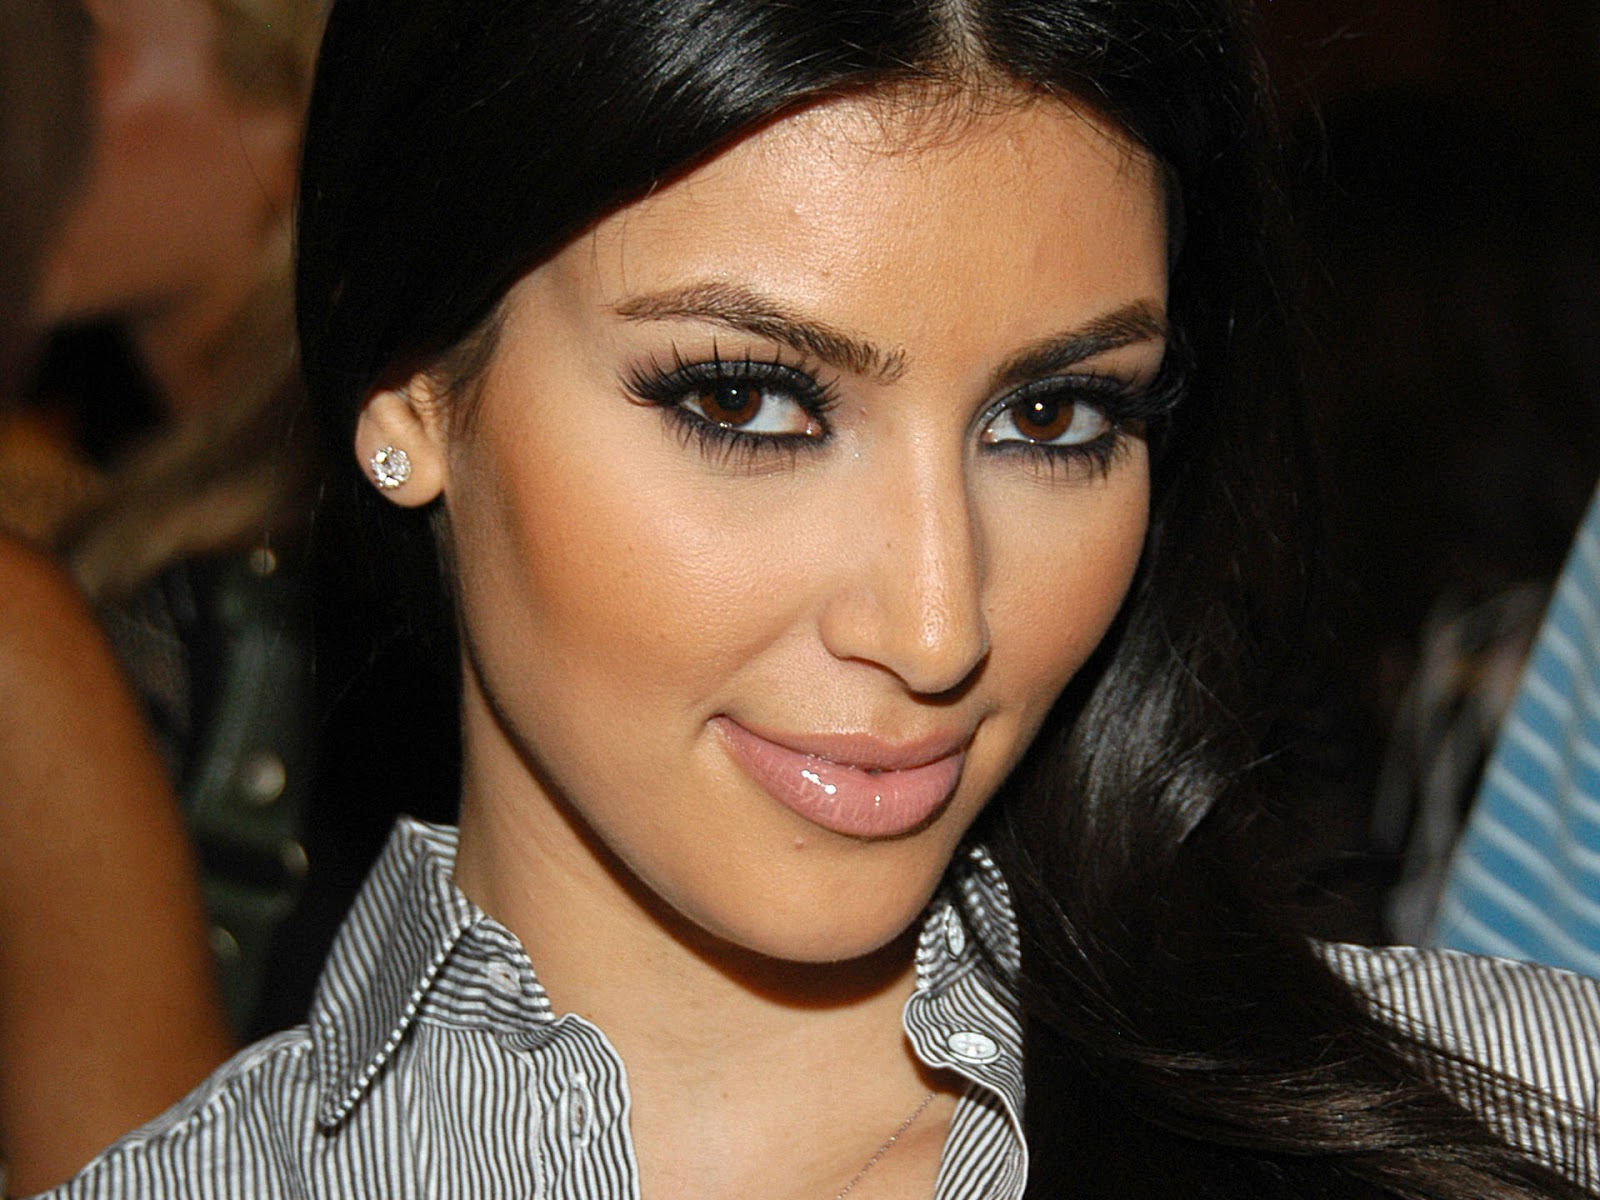 Hollywood Actress Kim Kardashian Hottest HD Wallpapers 2013 1600x1200